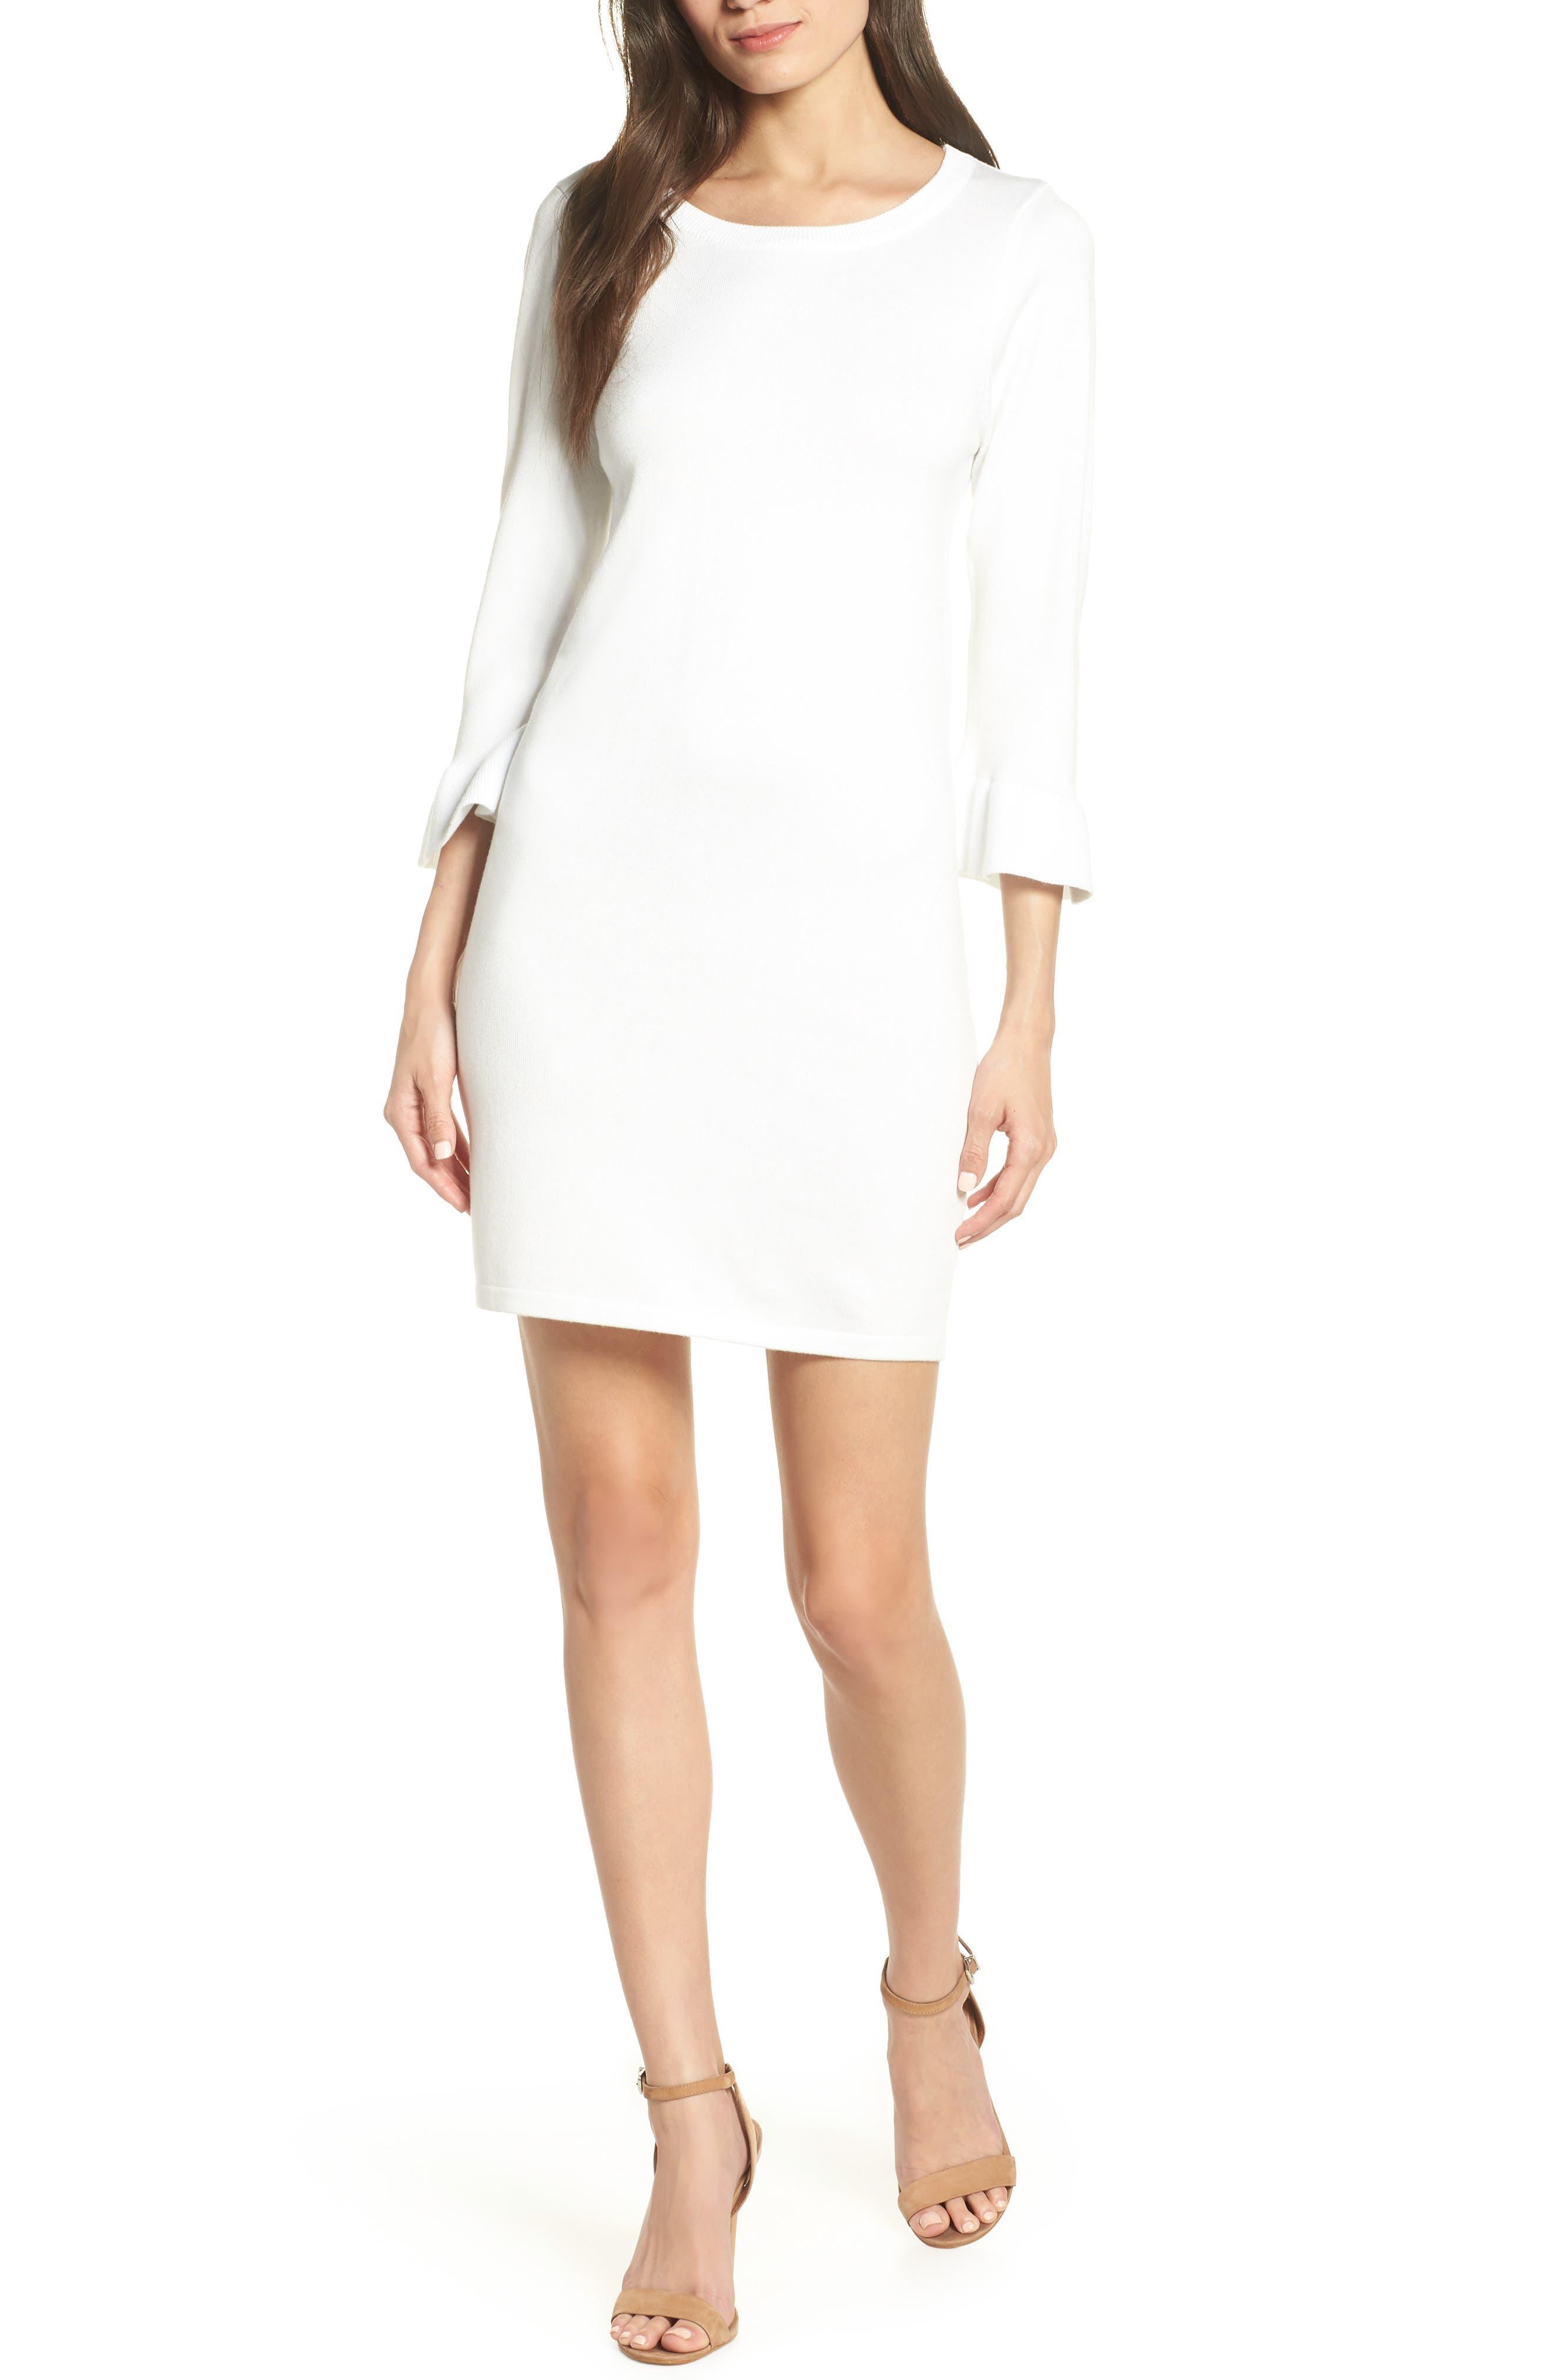 Bb Dakota Now Or Never Ruffle Sweater Dress, Ivory